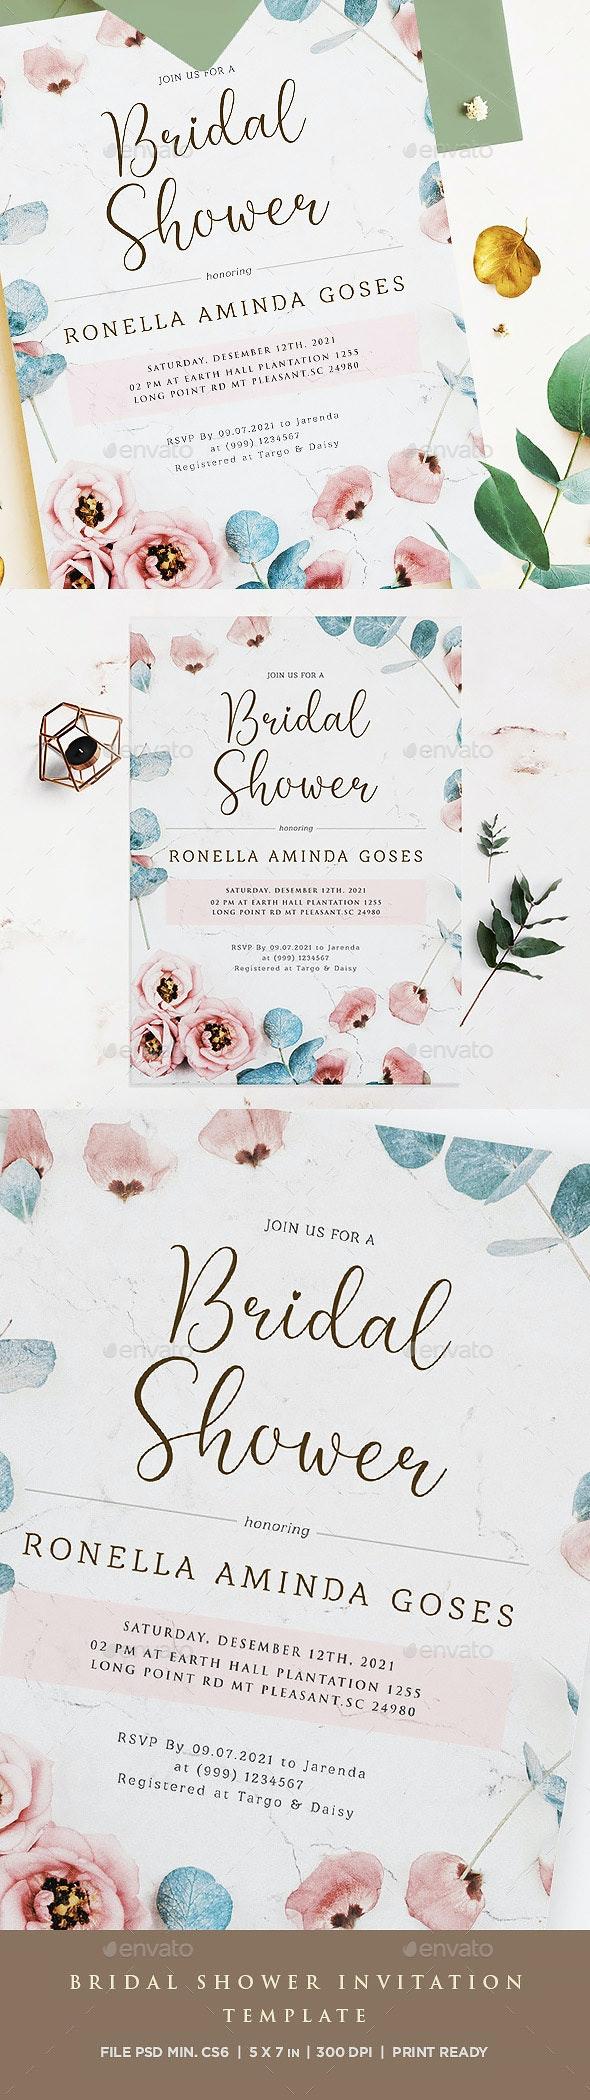 Printable Bridal Shower Invitation Template - Invitations Cards & Invites